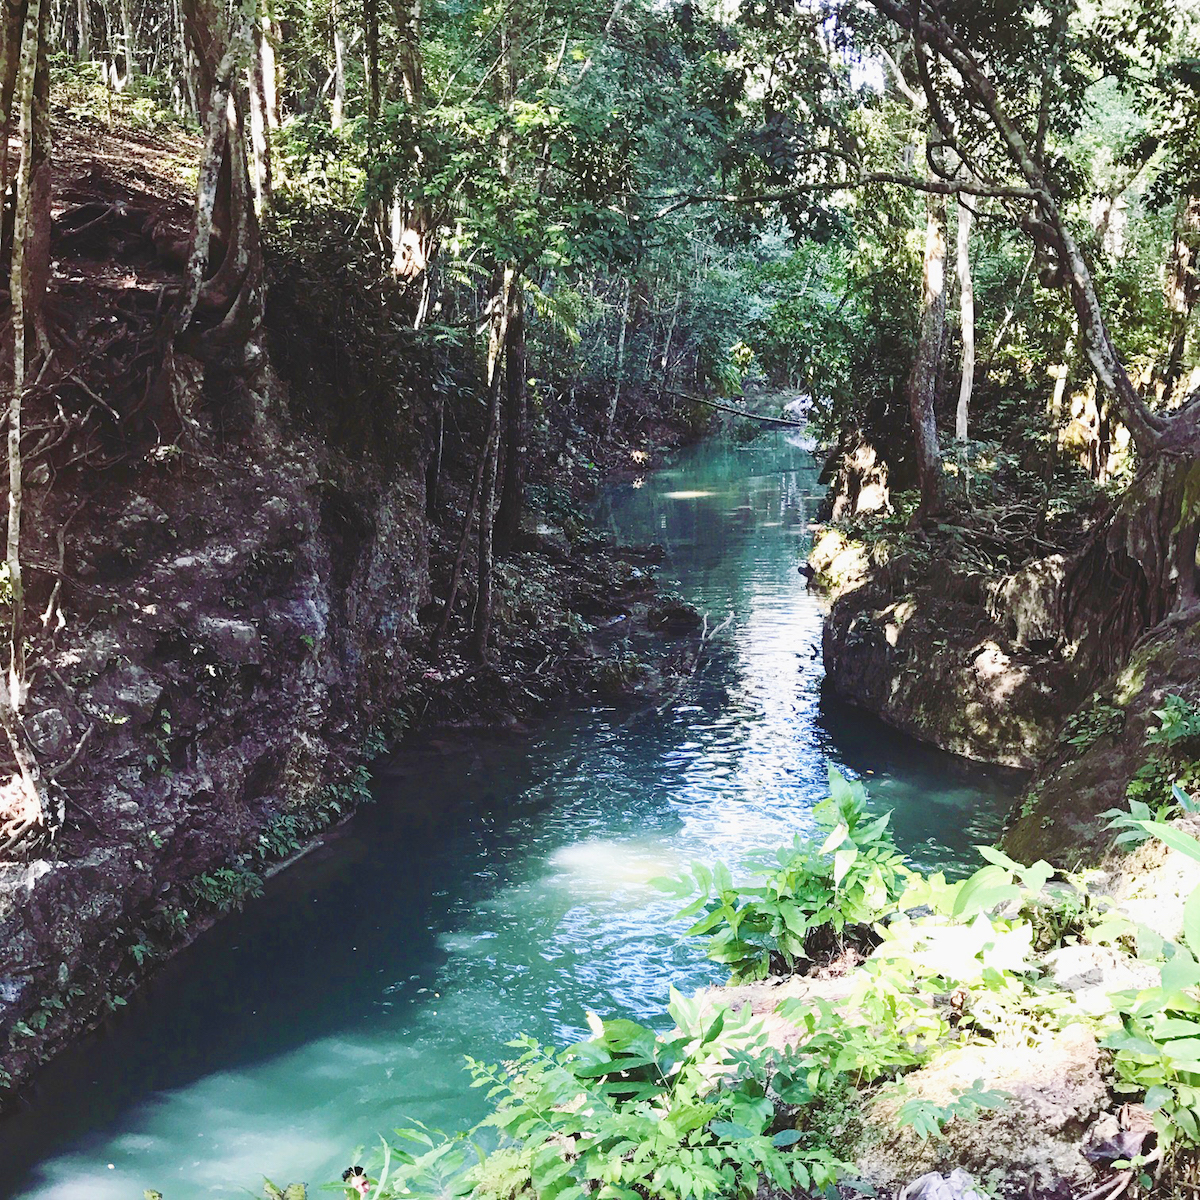 Belize waterfall Cristo Rey Falls swimming hole.jpg